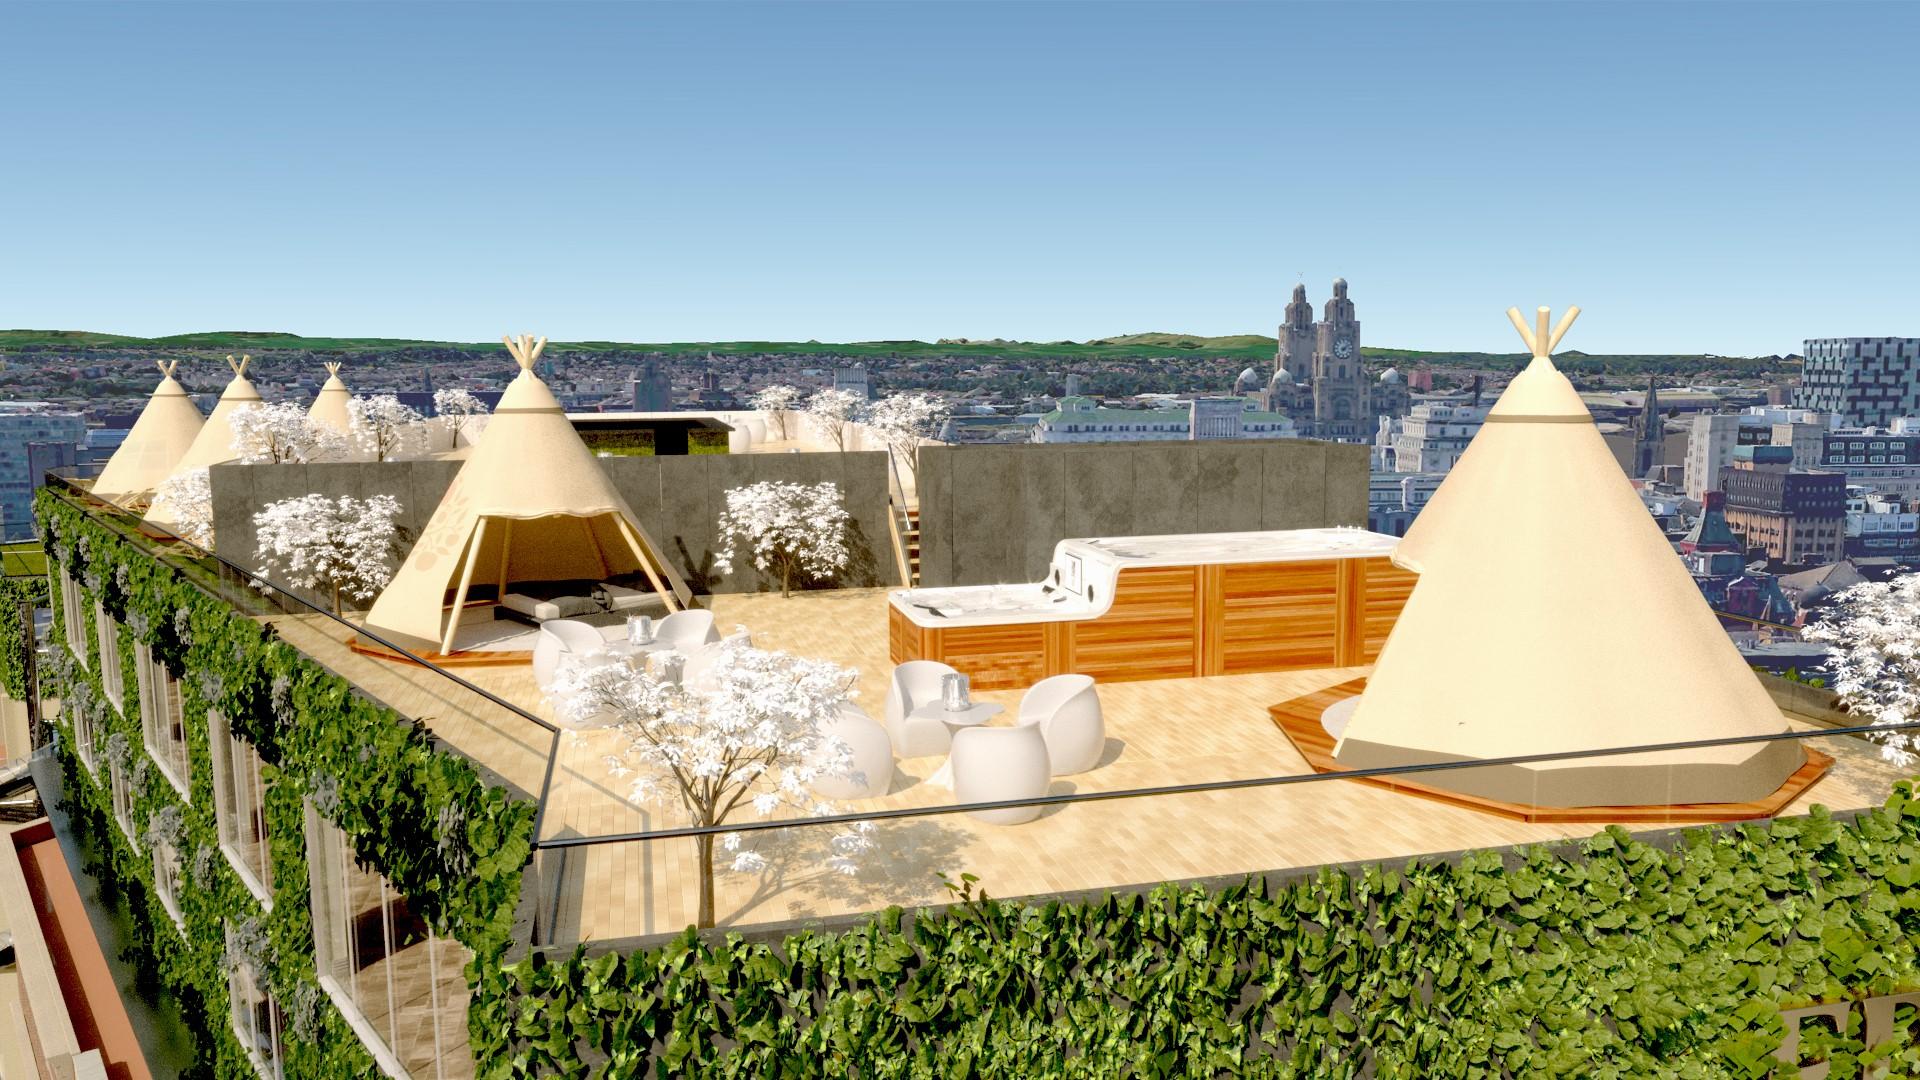 Tipi rooftop venue